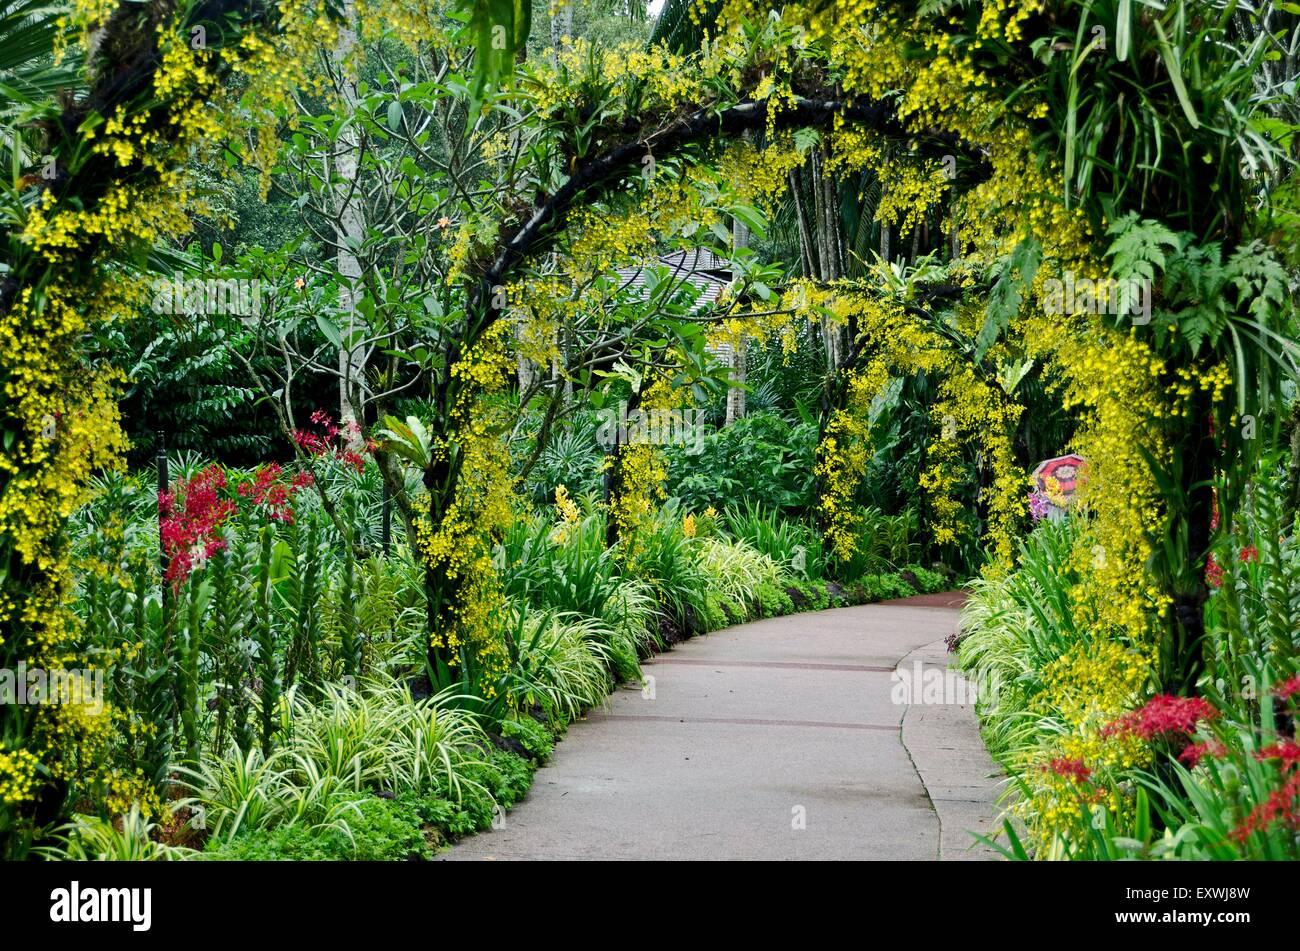 Orchid garden, Singapur City, Singapur, Asia - Stock Image